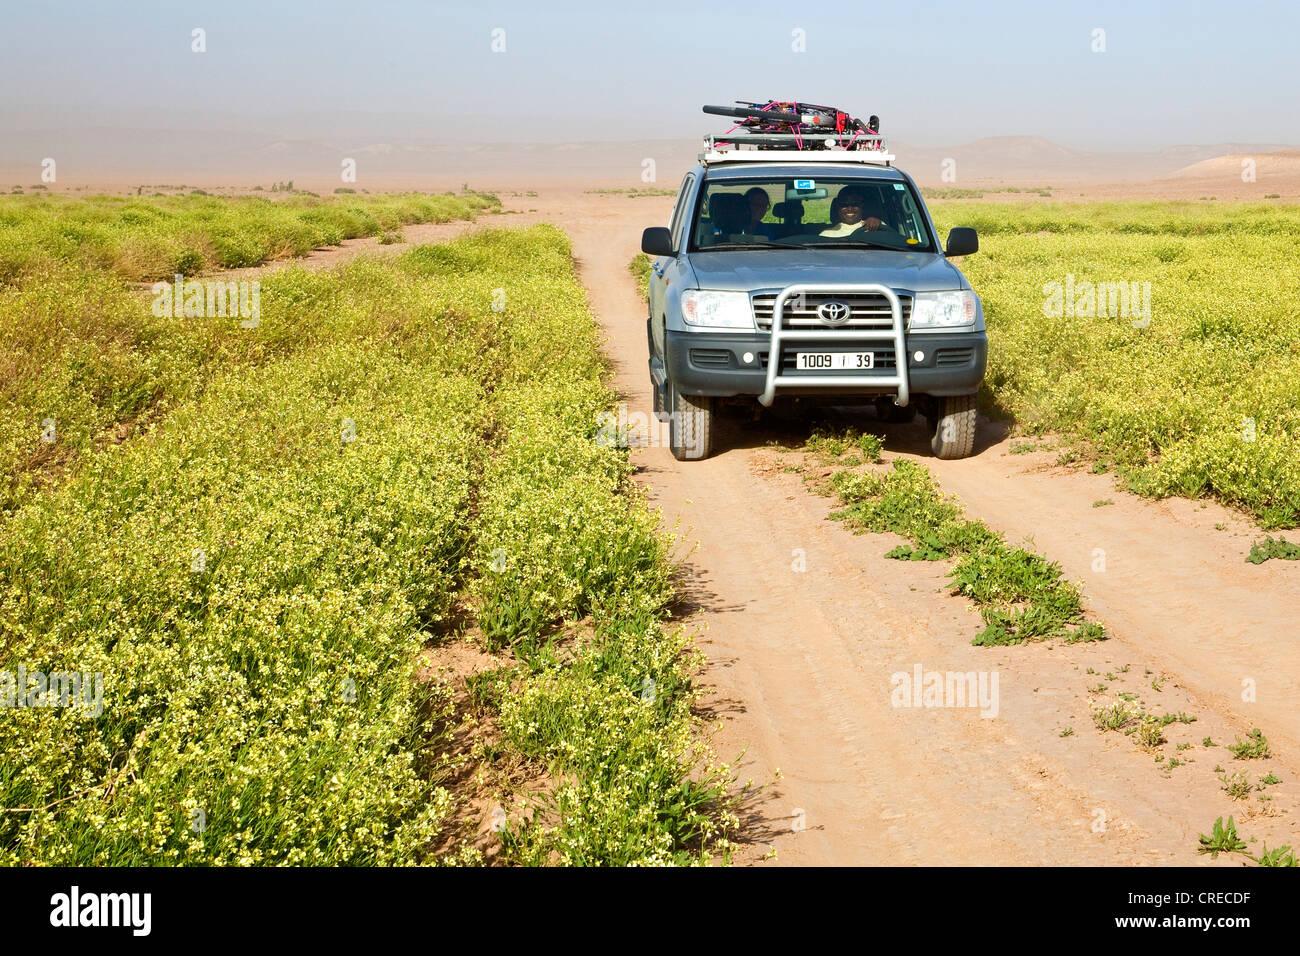 Toyota Landcruiser four wheel drive vehicle passing cassia plants on a gravel road, Erg Chegaga region, Sahara desert - Stock Image